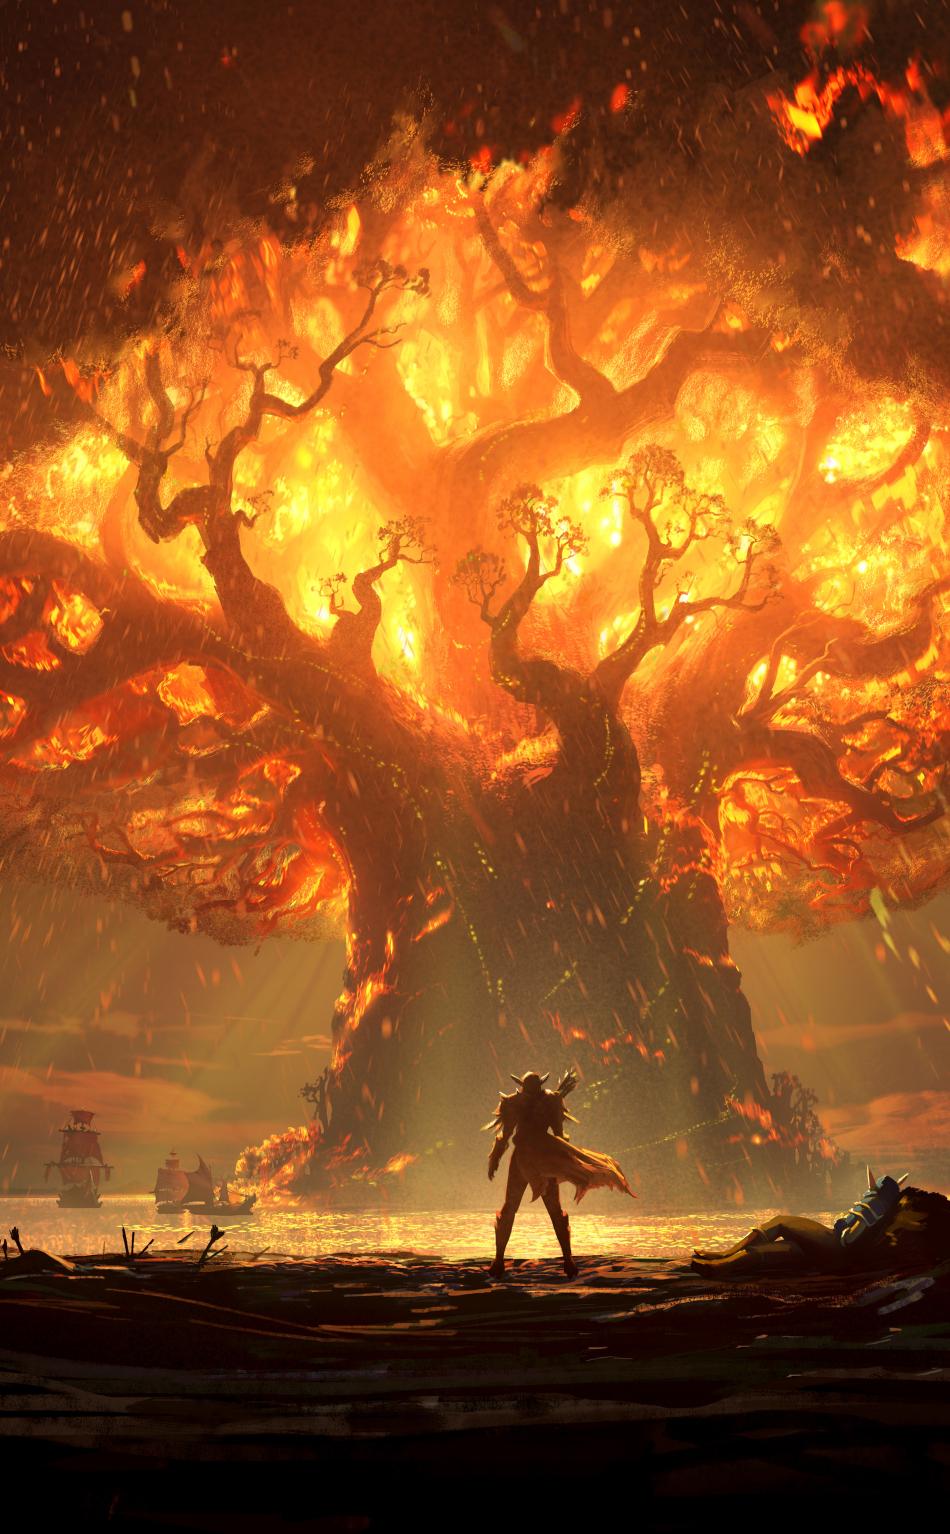 World Of Warcraft Battle For Azeroth Artwork Hd 10k Wallpaper